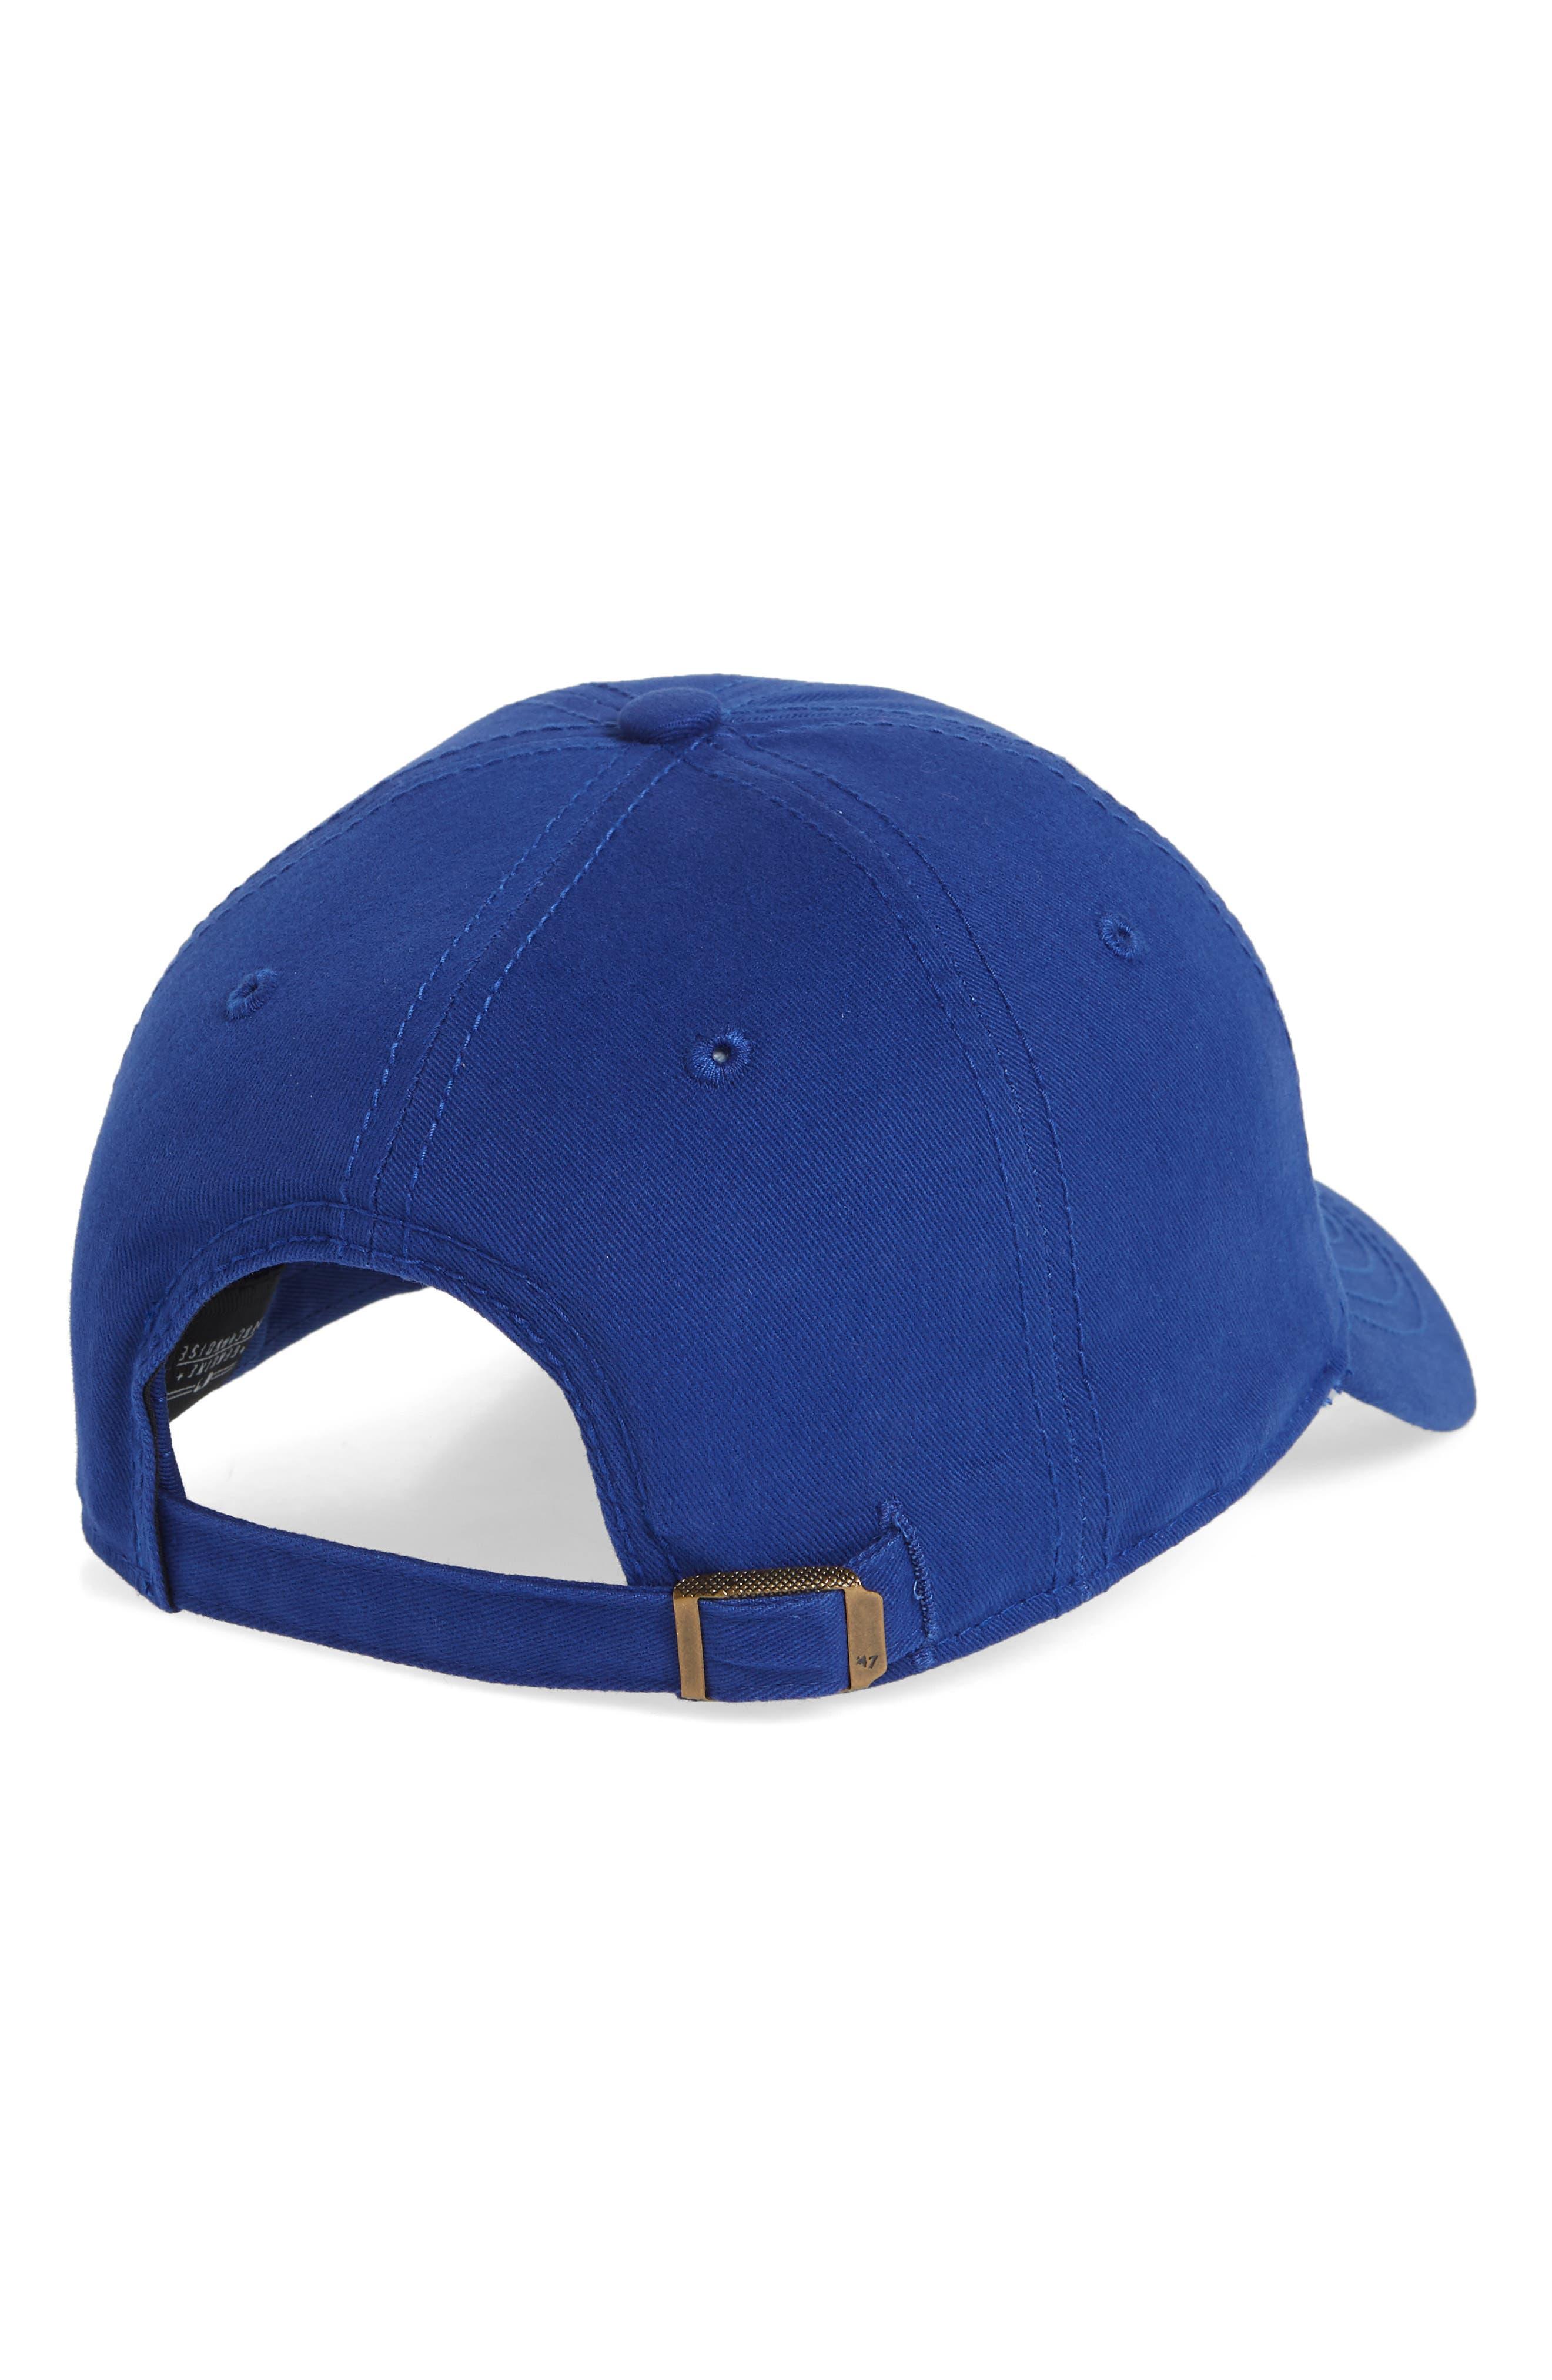 Miata Clean-Up Los Angeles Dodgers Baseball Cap,                             Alternate thumbnail 2, color,                             400